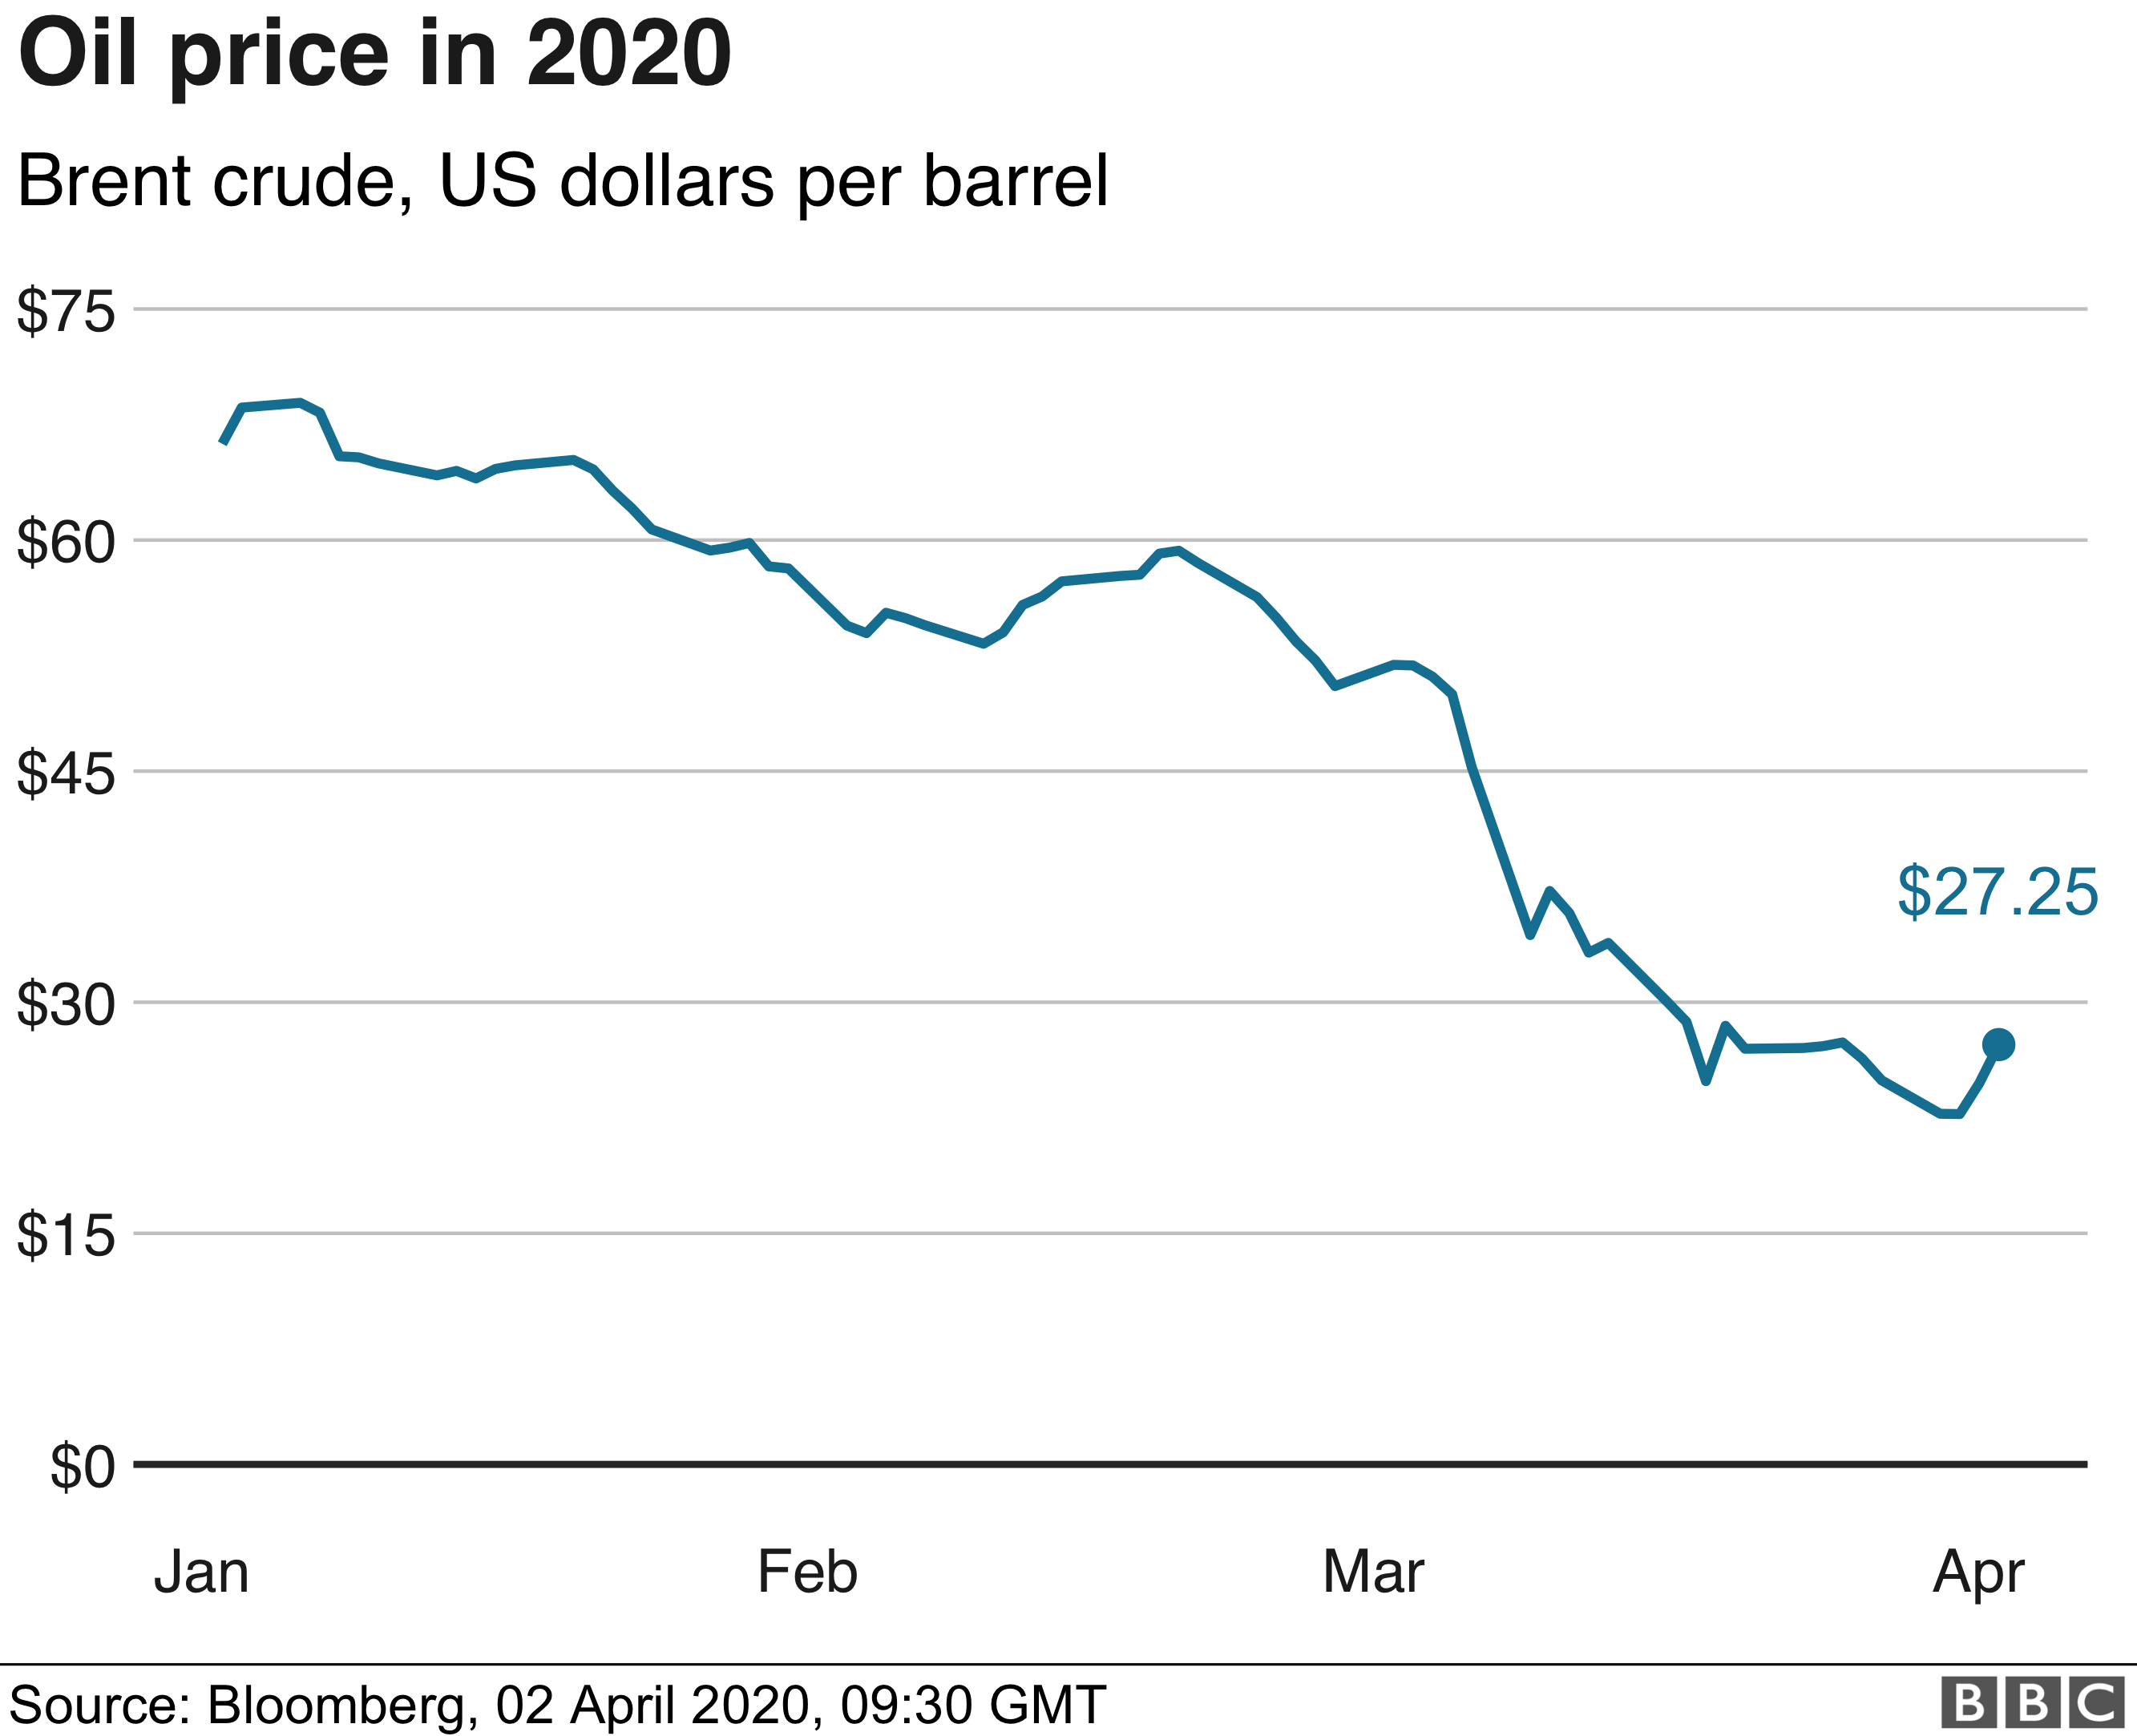 Coronavirus Oil Prices Surge On Hopes Of A Price War Truce Bbc News